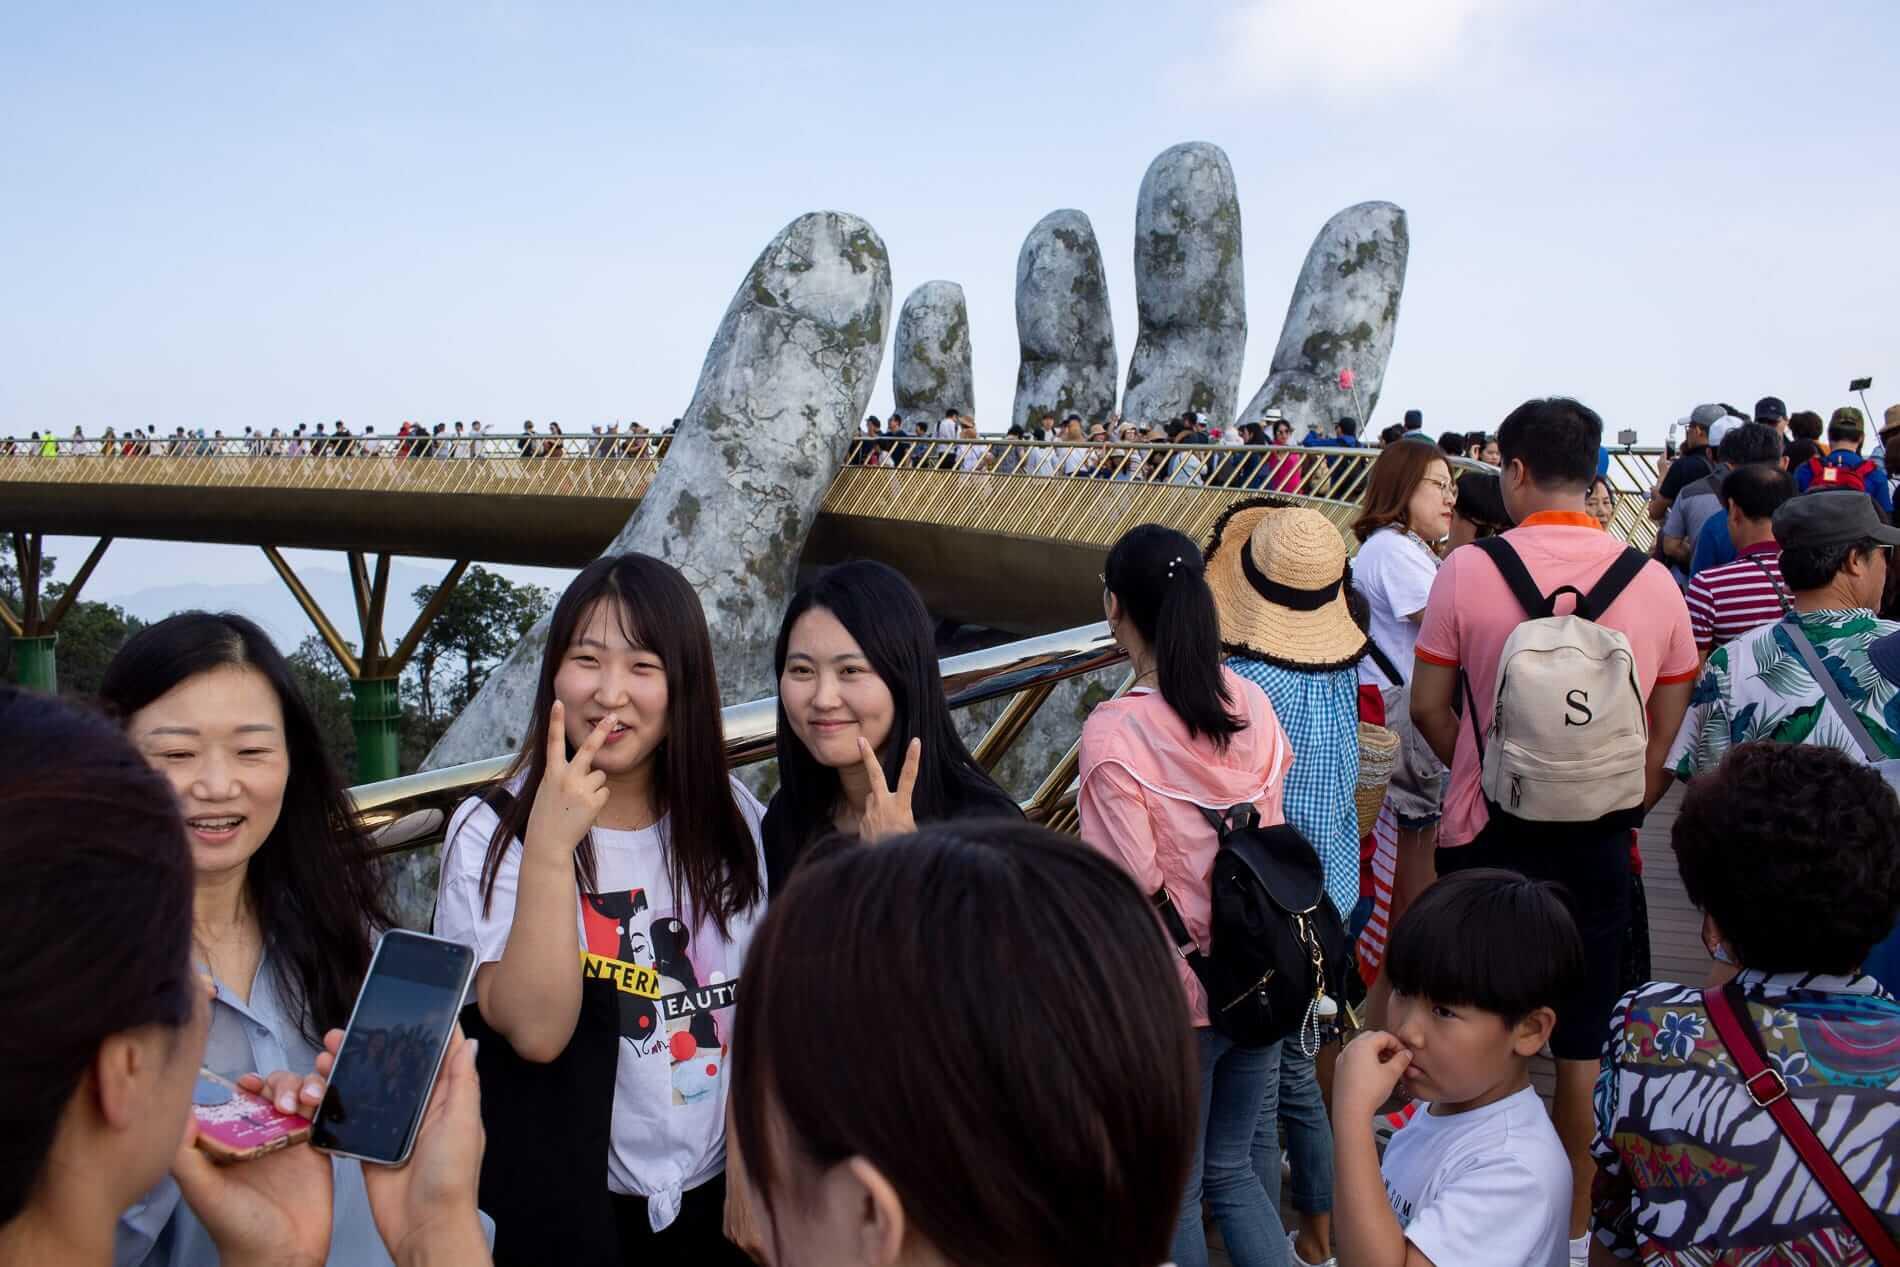 busy crowd take photos on the Golden Bridge